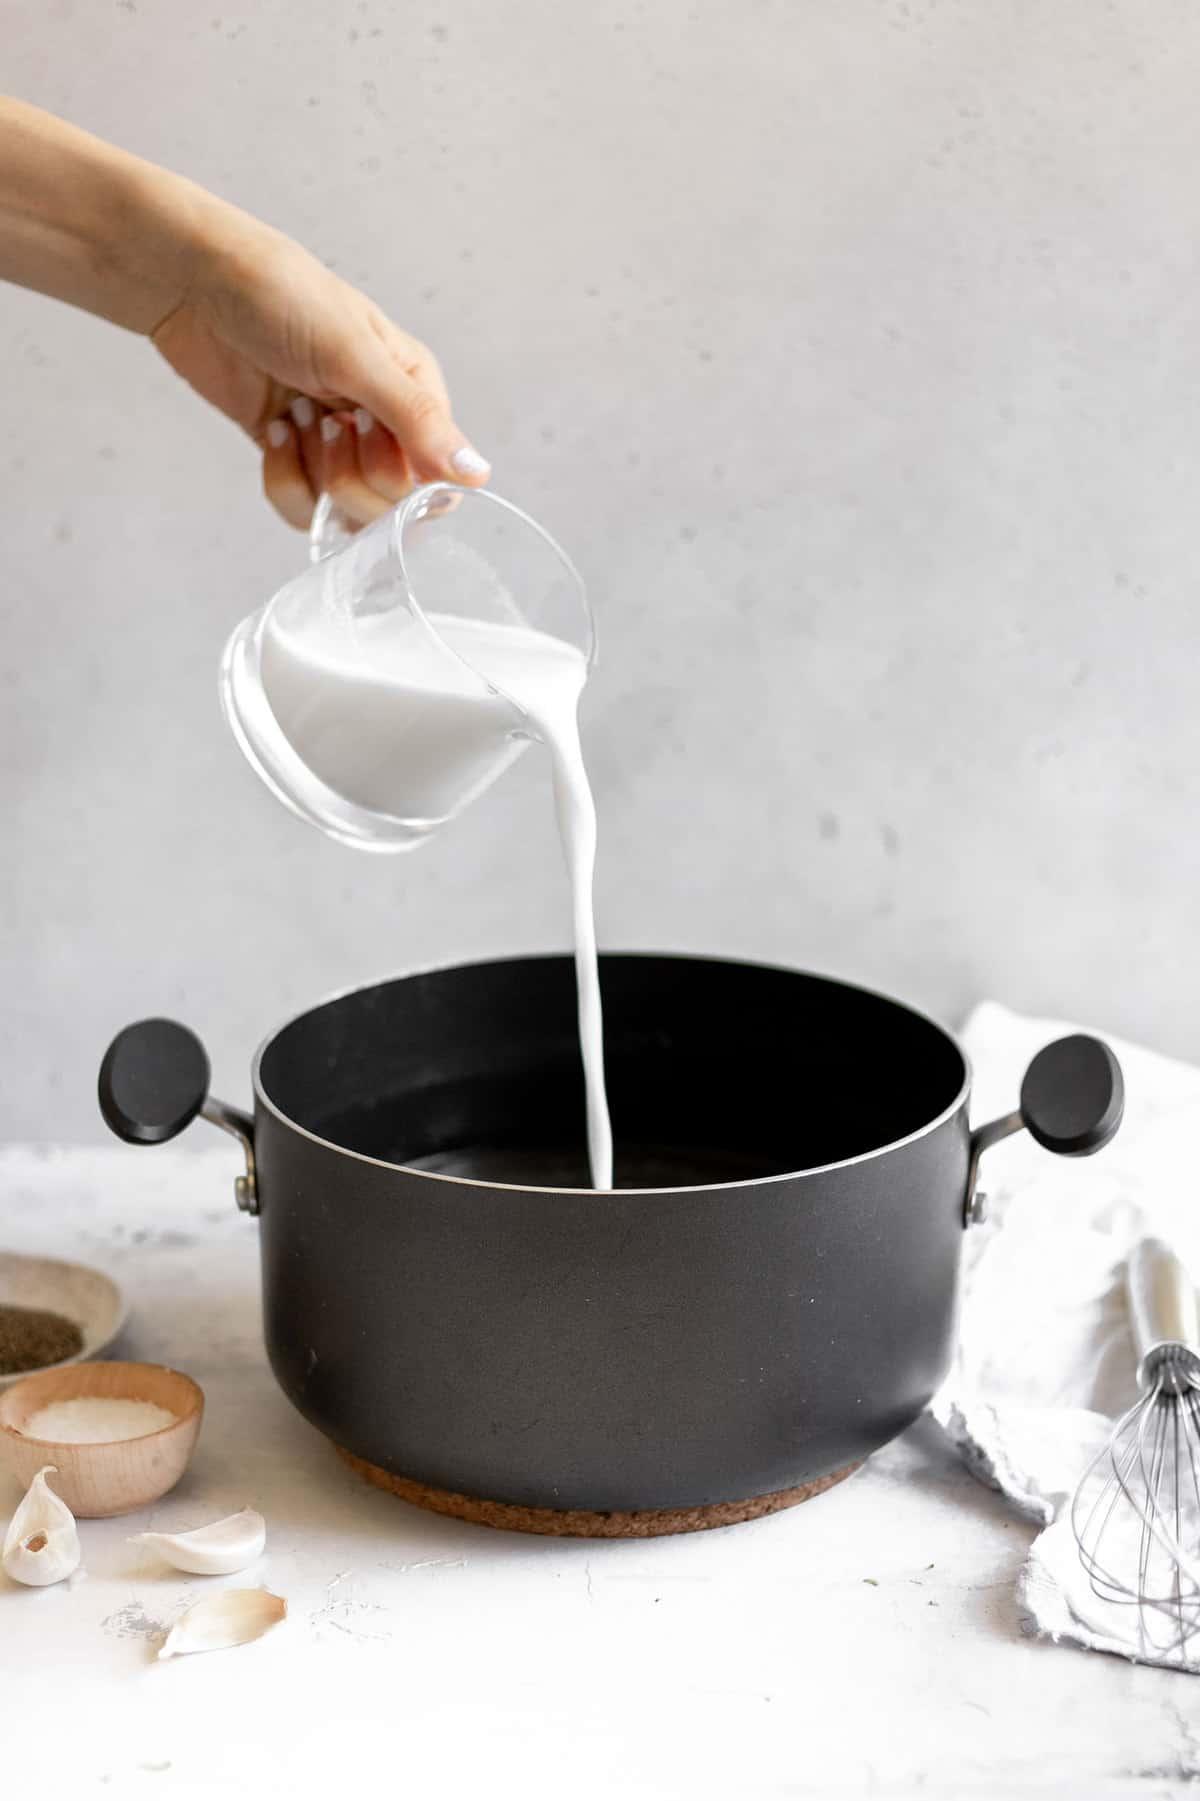 Pouring milk into a stock pot.